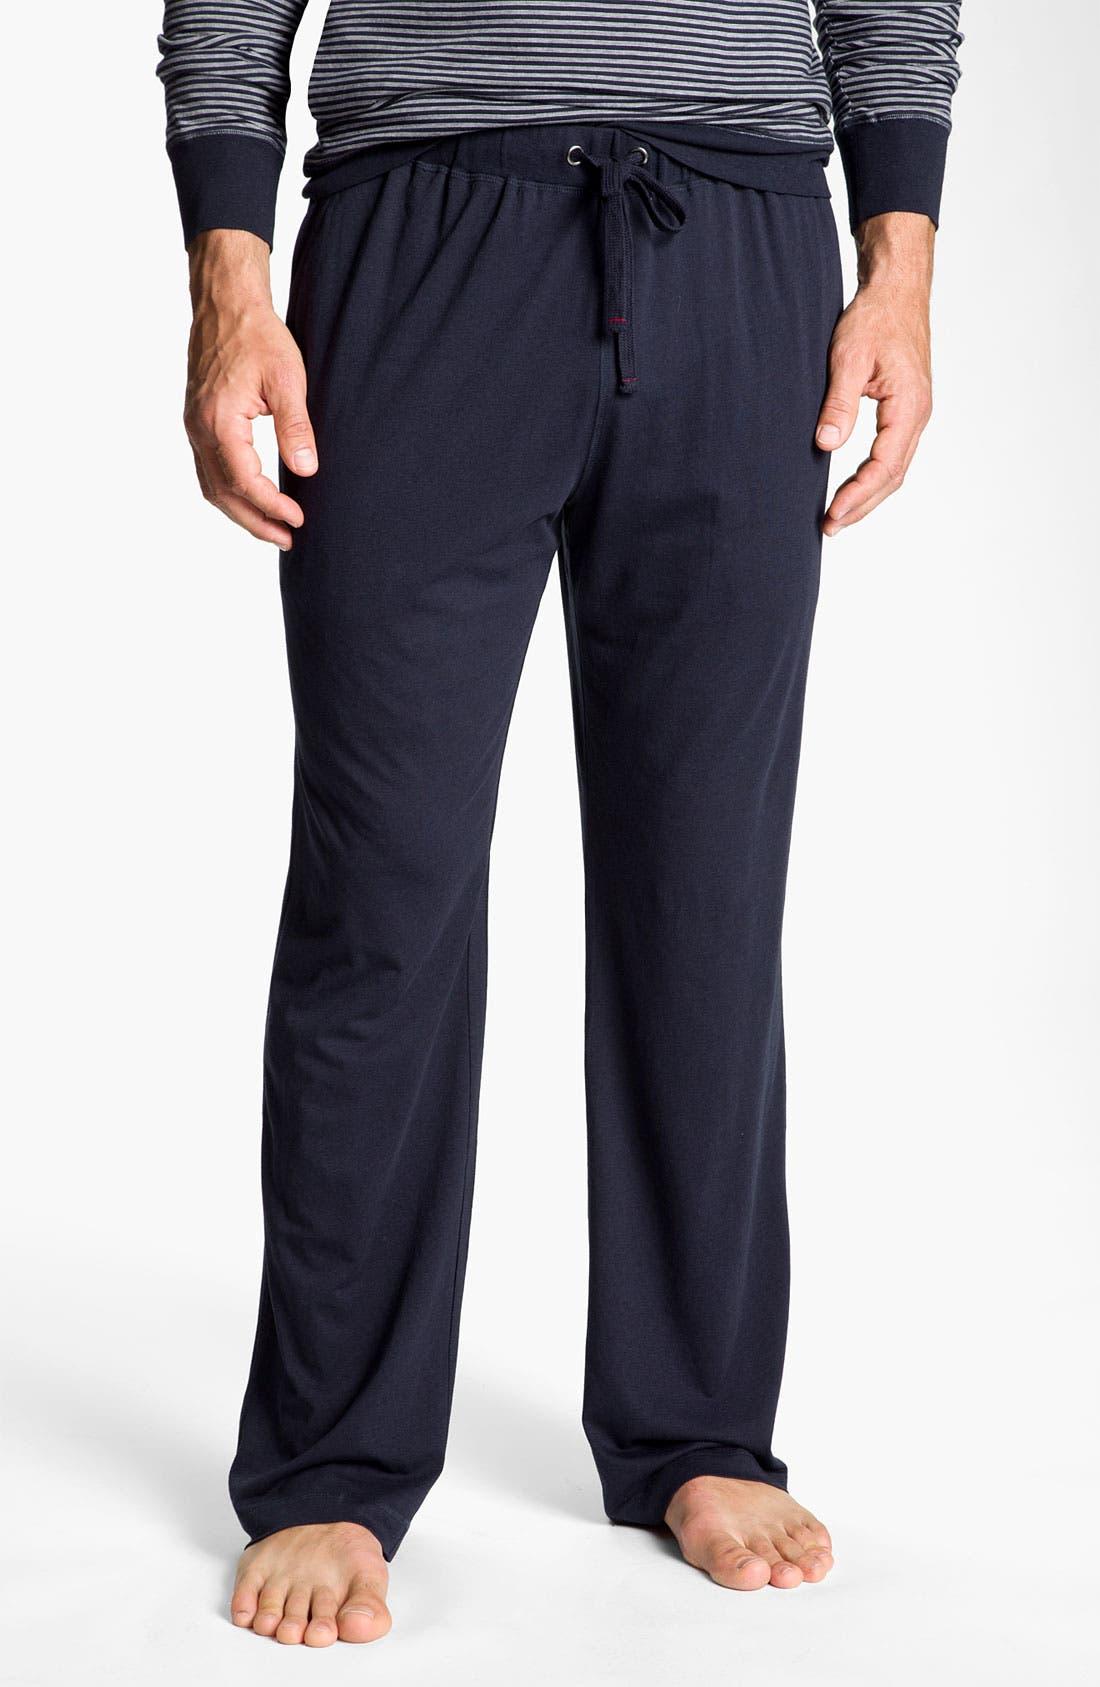 Alternate Image 1 Selected - Daniel Buchler Drawstring Pants